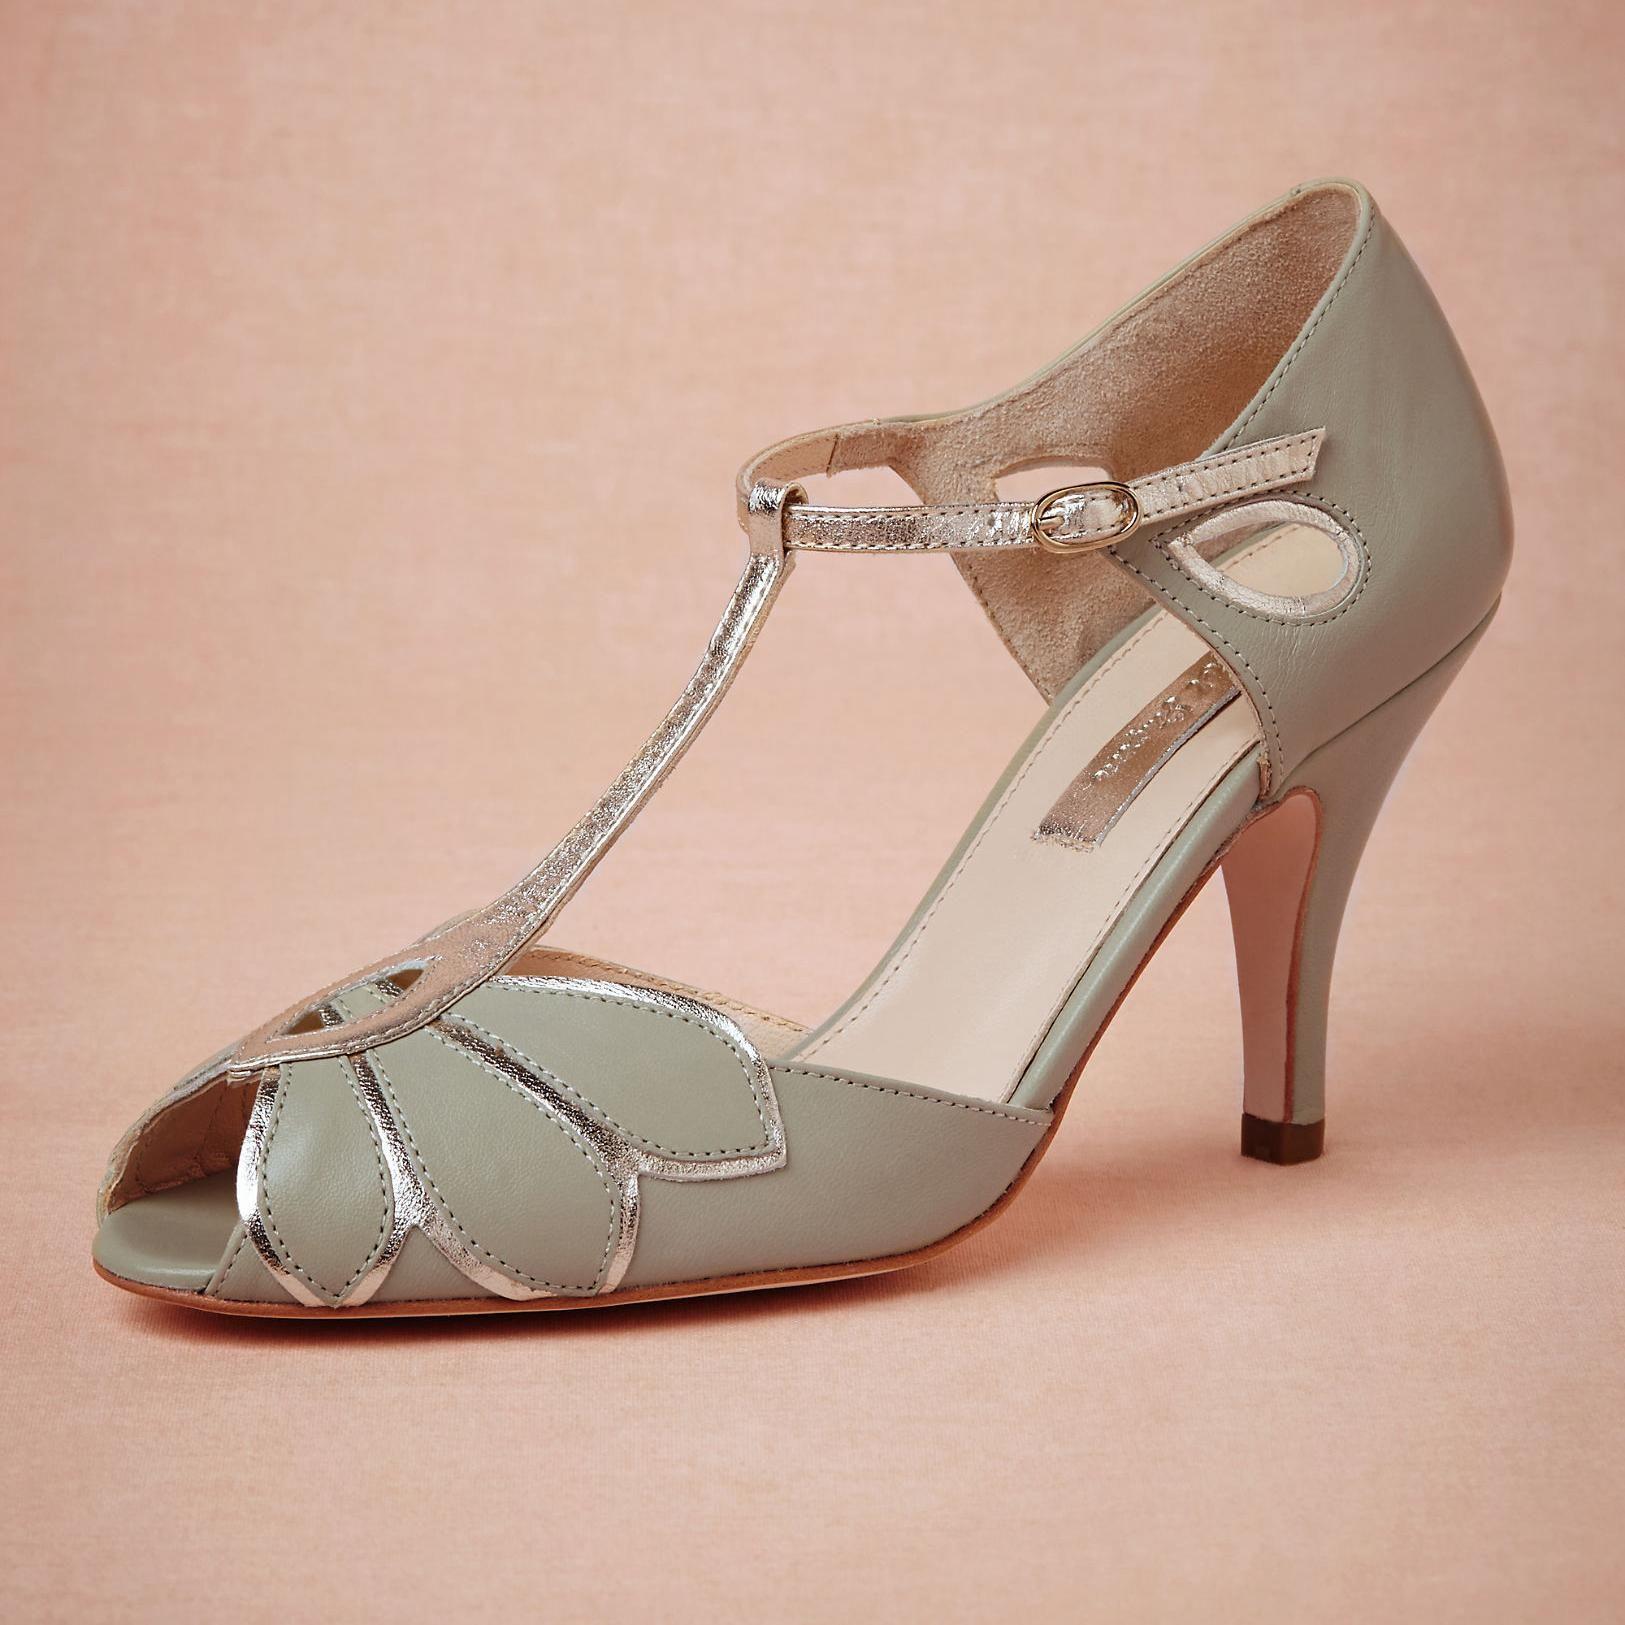 Vintage Mint Wedding Shoes Pumps Mimosa T Straps Buckle Closure Leather Party Dance 3 High Heels Women Sandals Short Boots